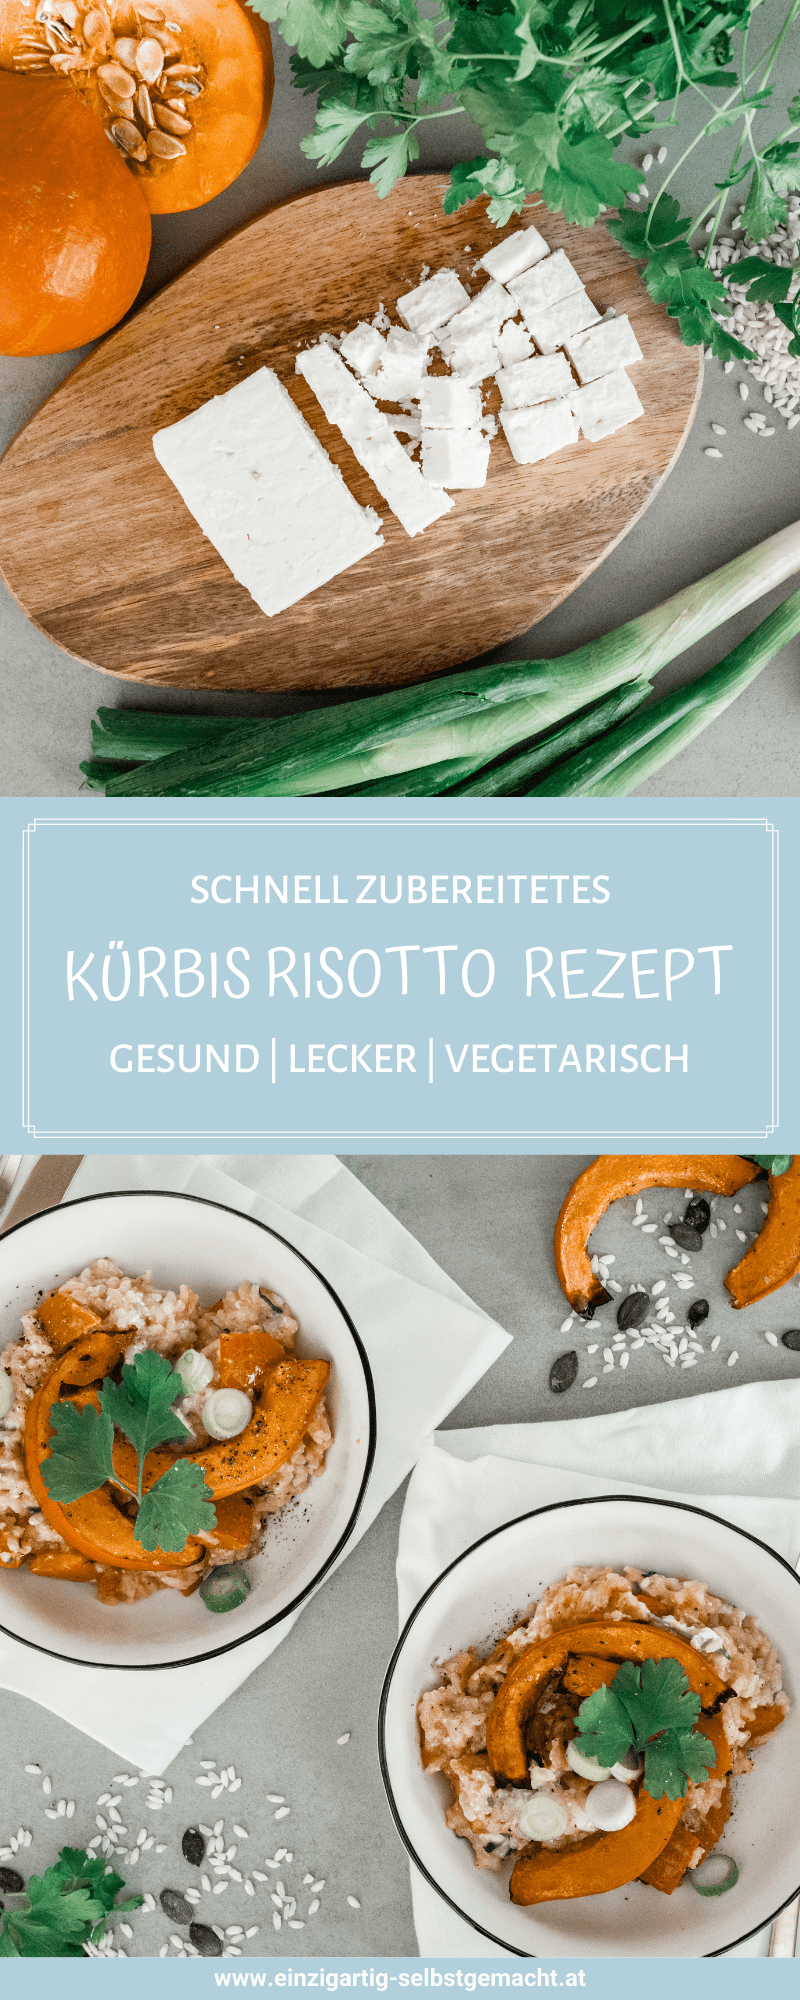 kürbis-risotto-pinterest